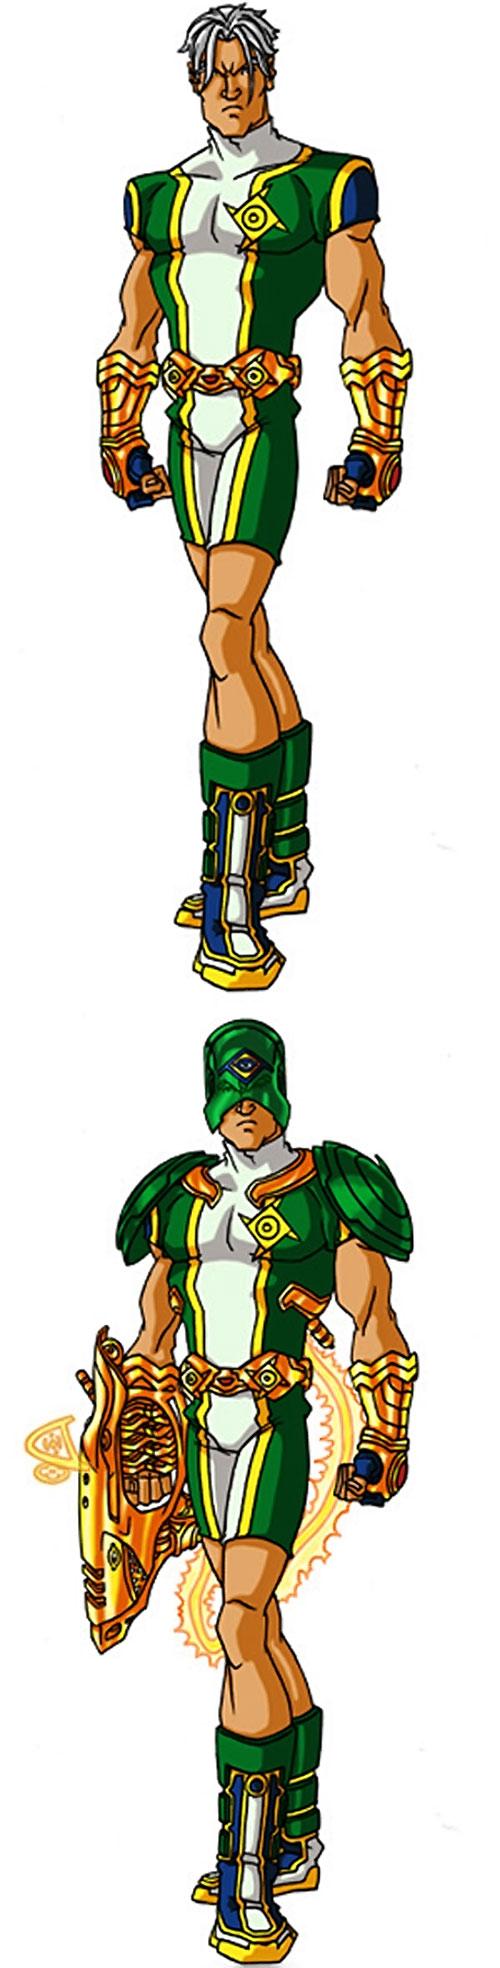 Marvel Boy (Noh-Varr) (Marvel Comics) by RonnieThunderbolts